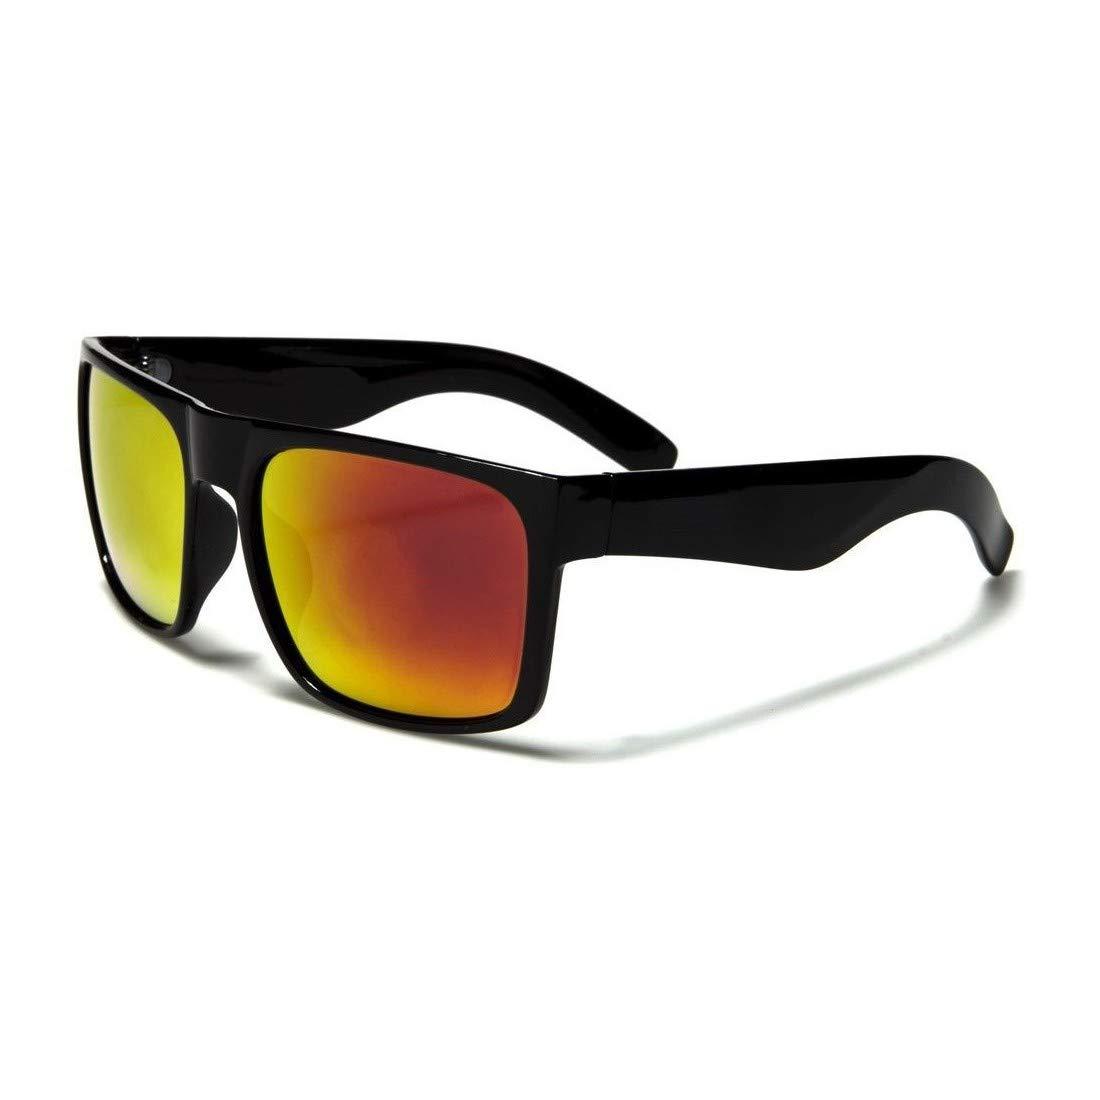 Black Square Frame Mens Fashion Sunglasses